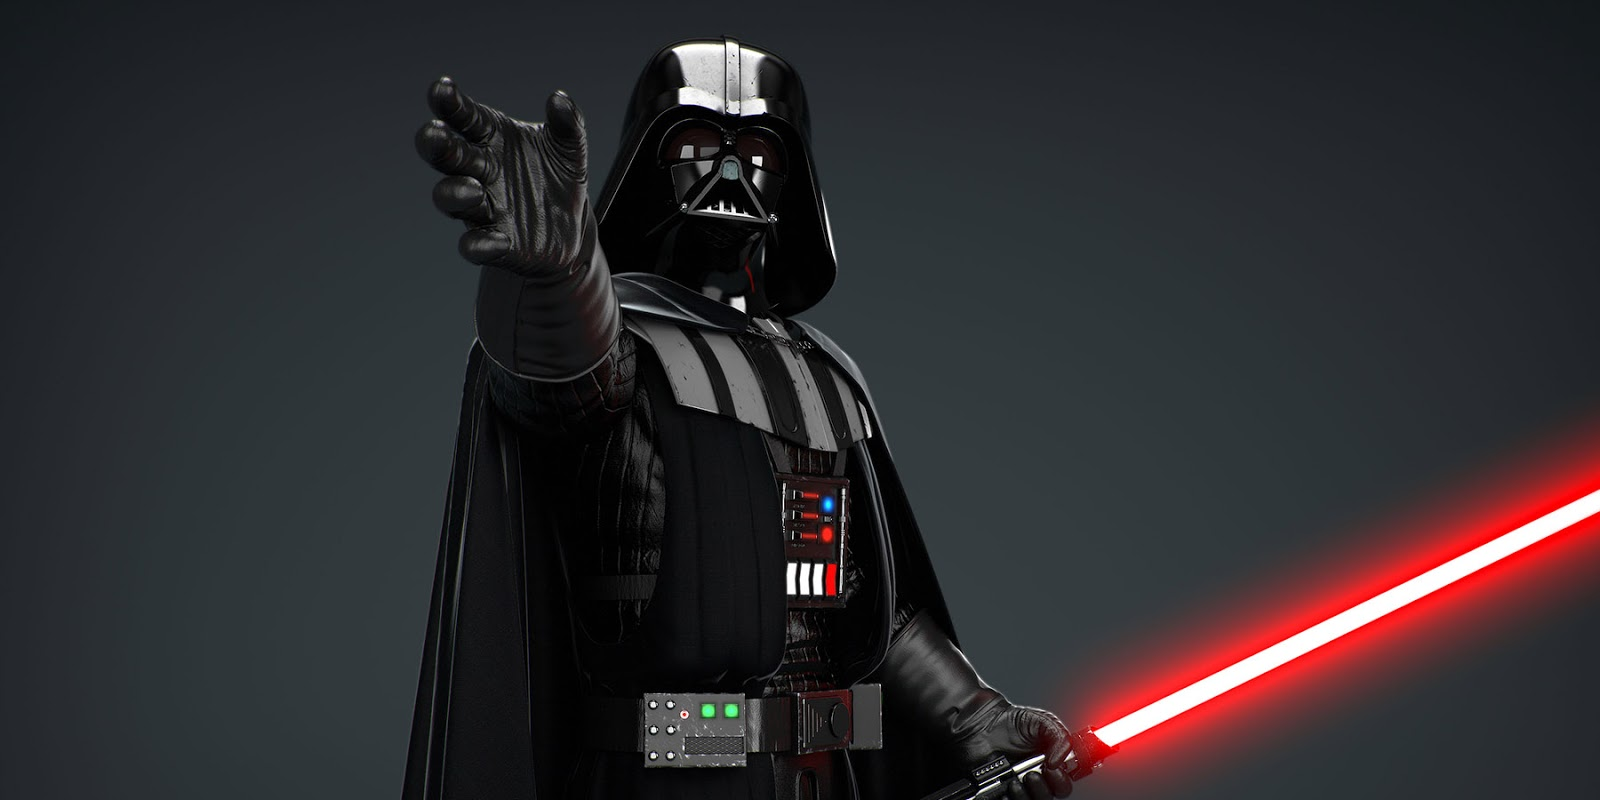 Top 10 Star Wars Helmets